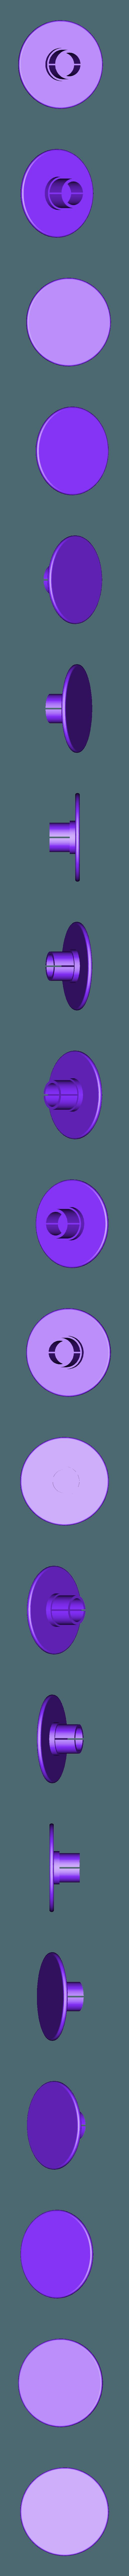 Bottom.stl Download free STL file Fidget Spinner for Smaller Hands - Spinner B • 3D printer model, crzldesign